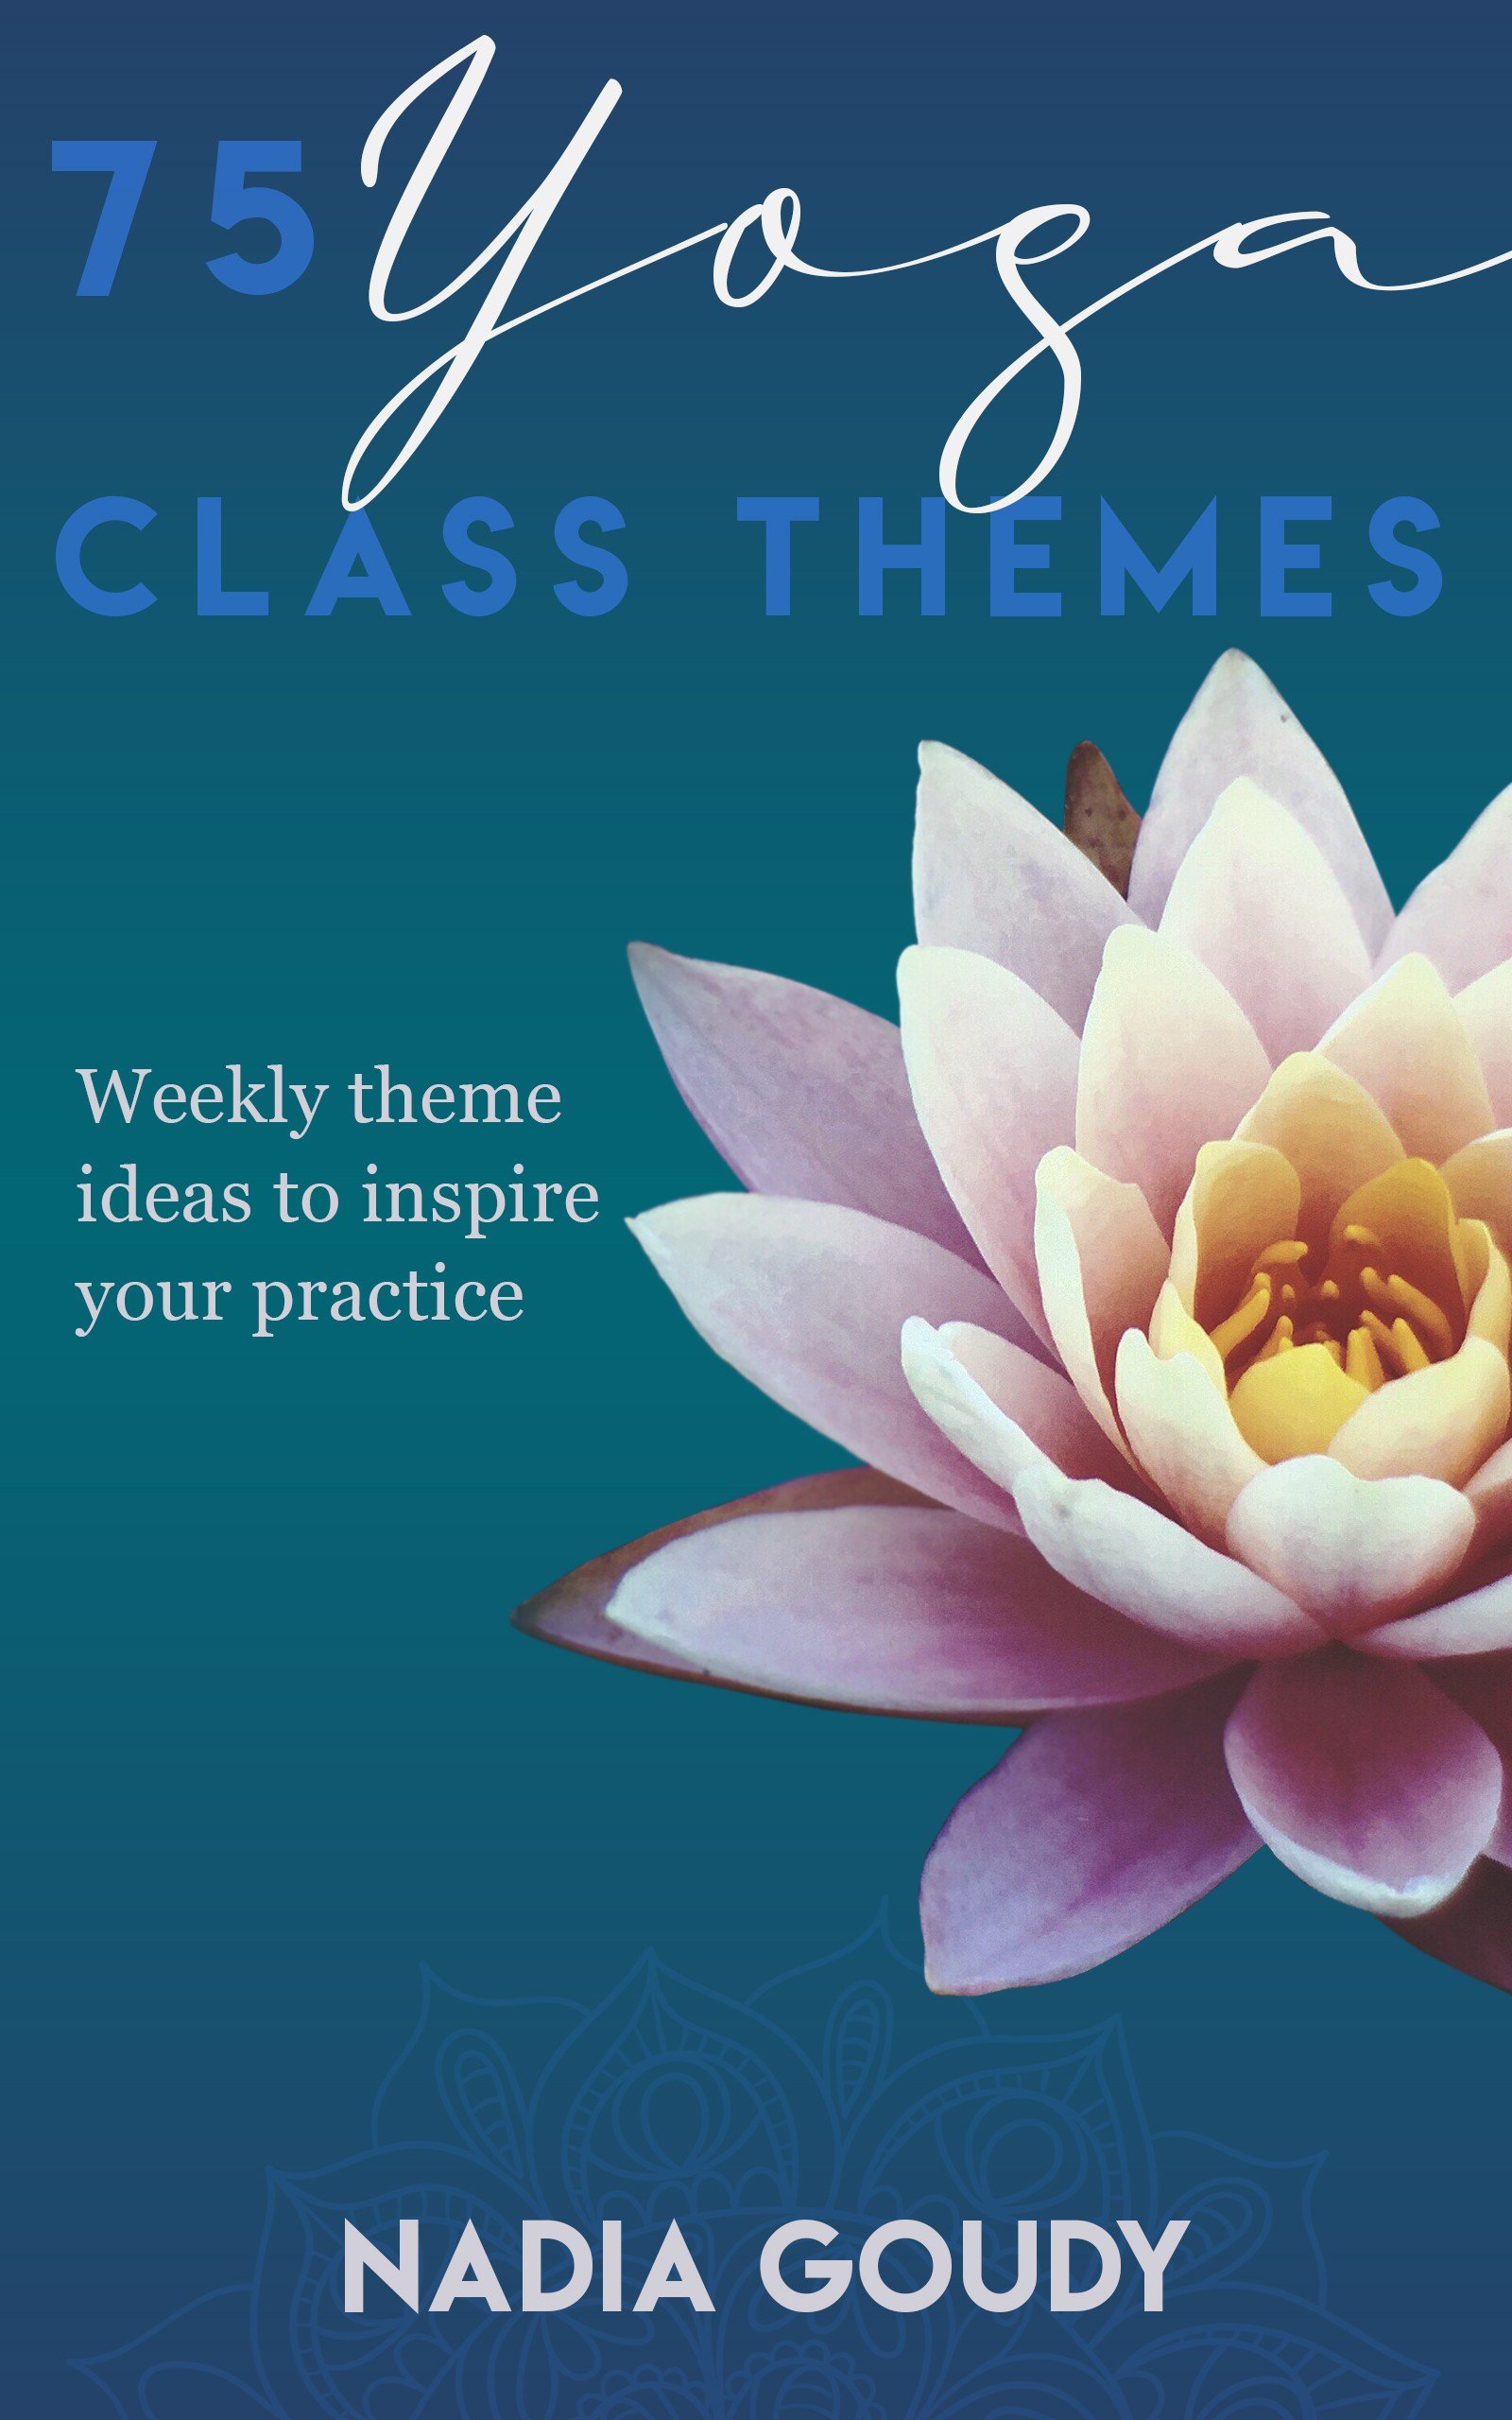 Yoga Class Themes Book Contest